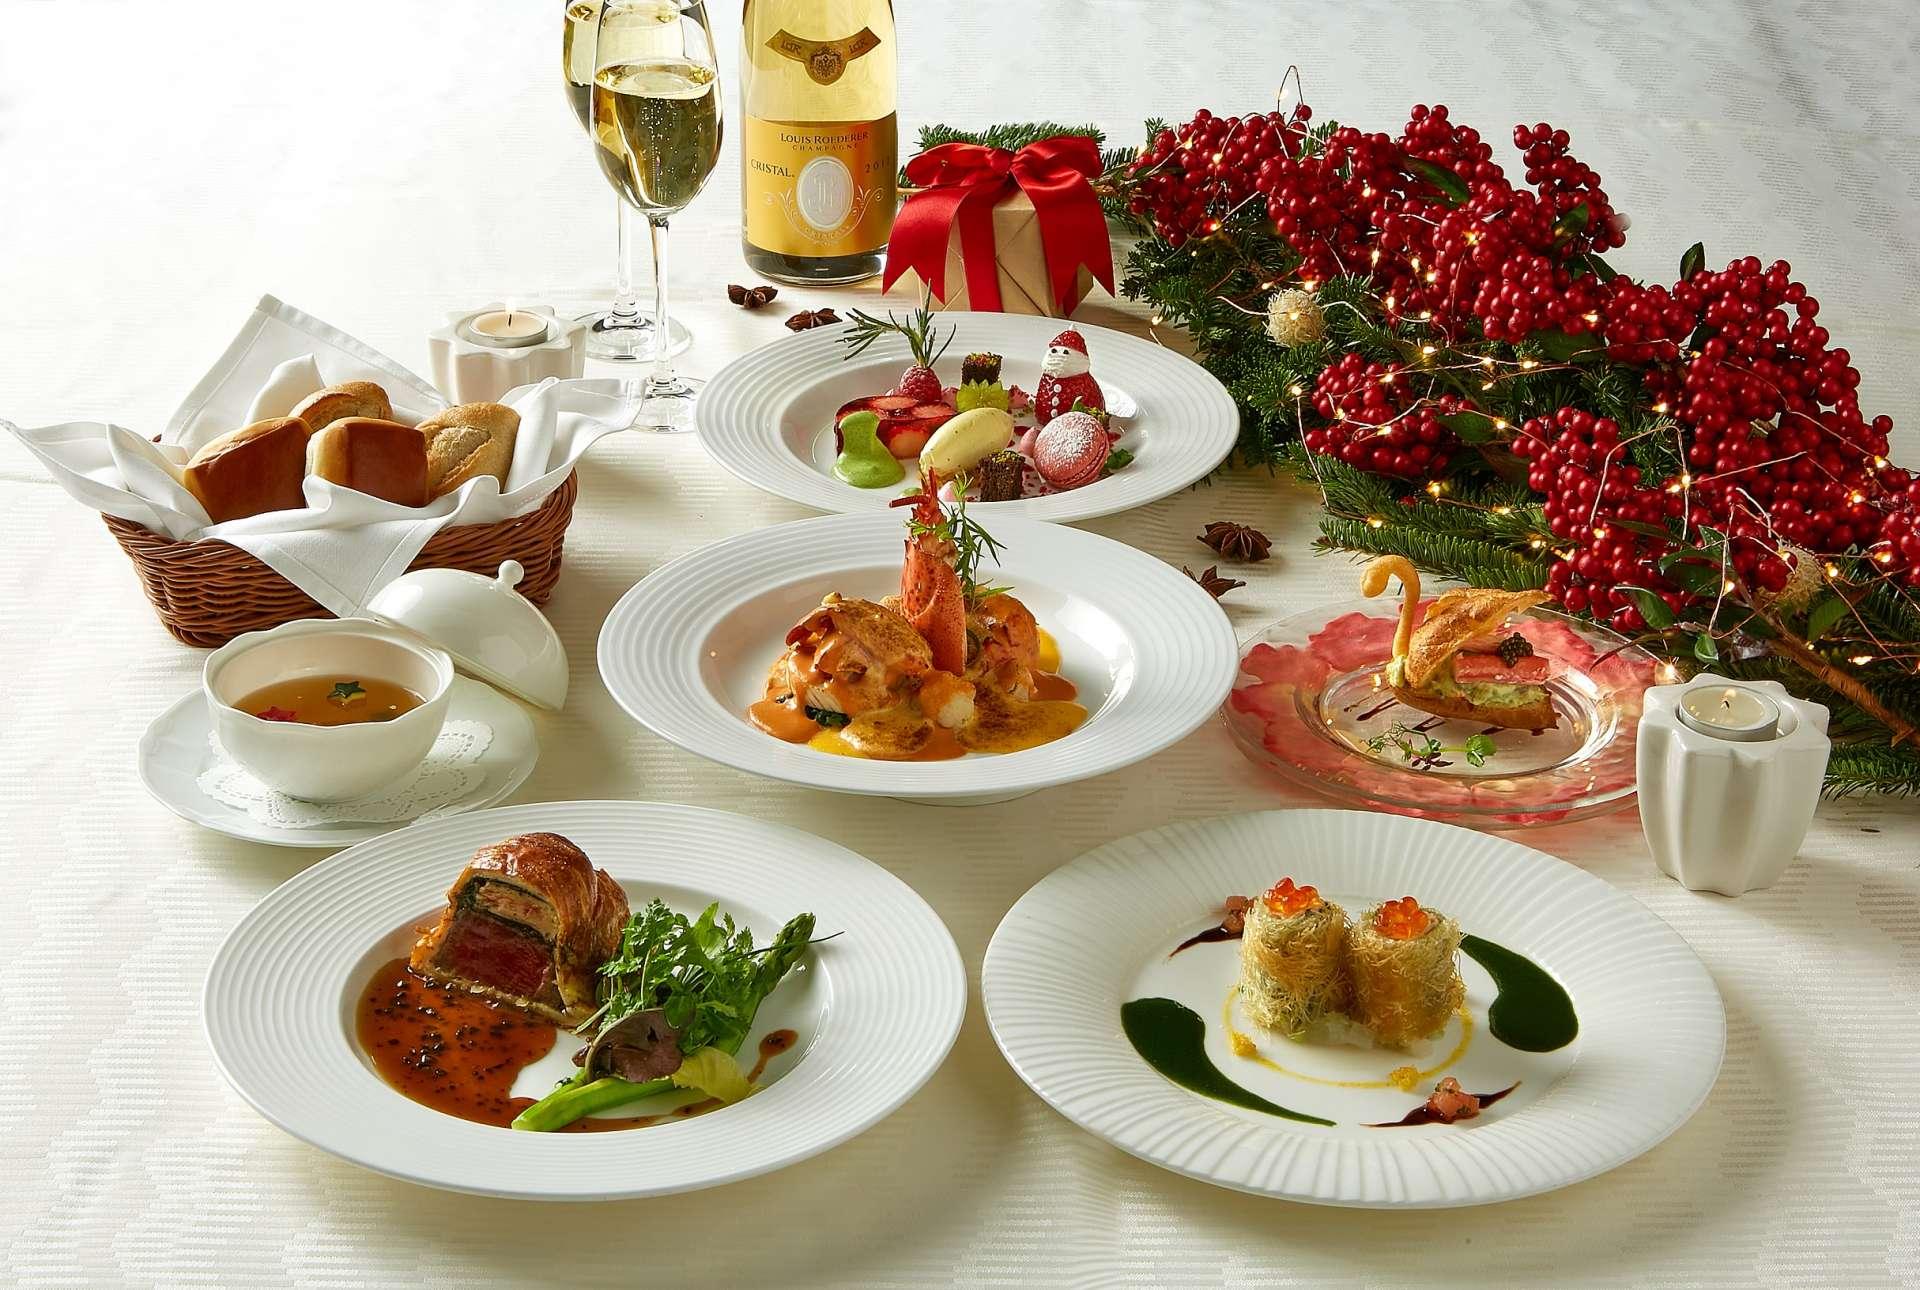 <GoToトラベルキャンペーン割引対象>クリスマスディナー付プラン◆2食付◆